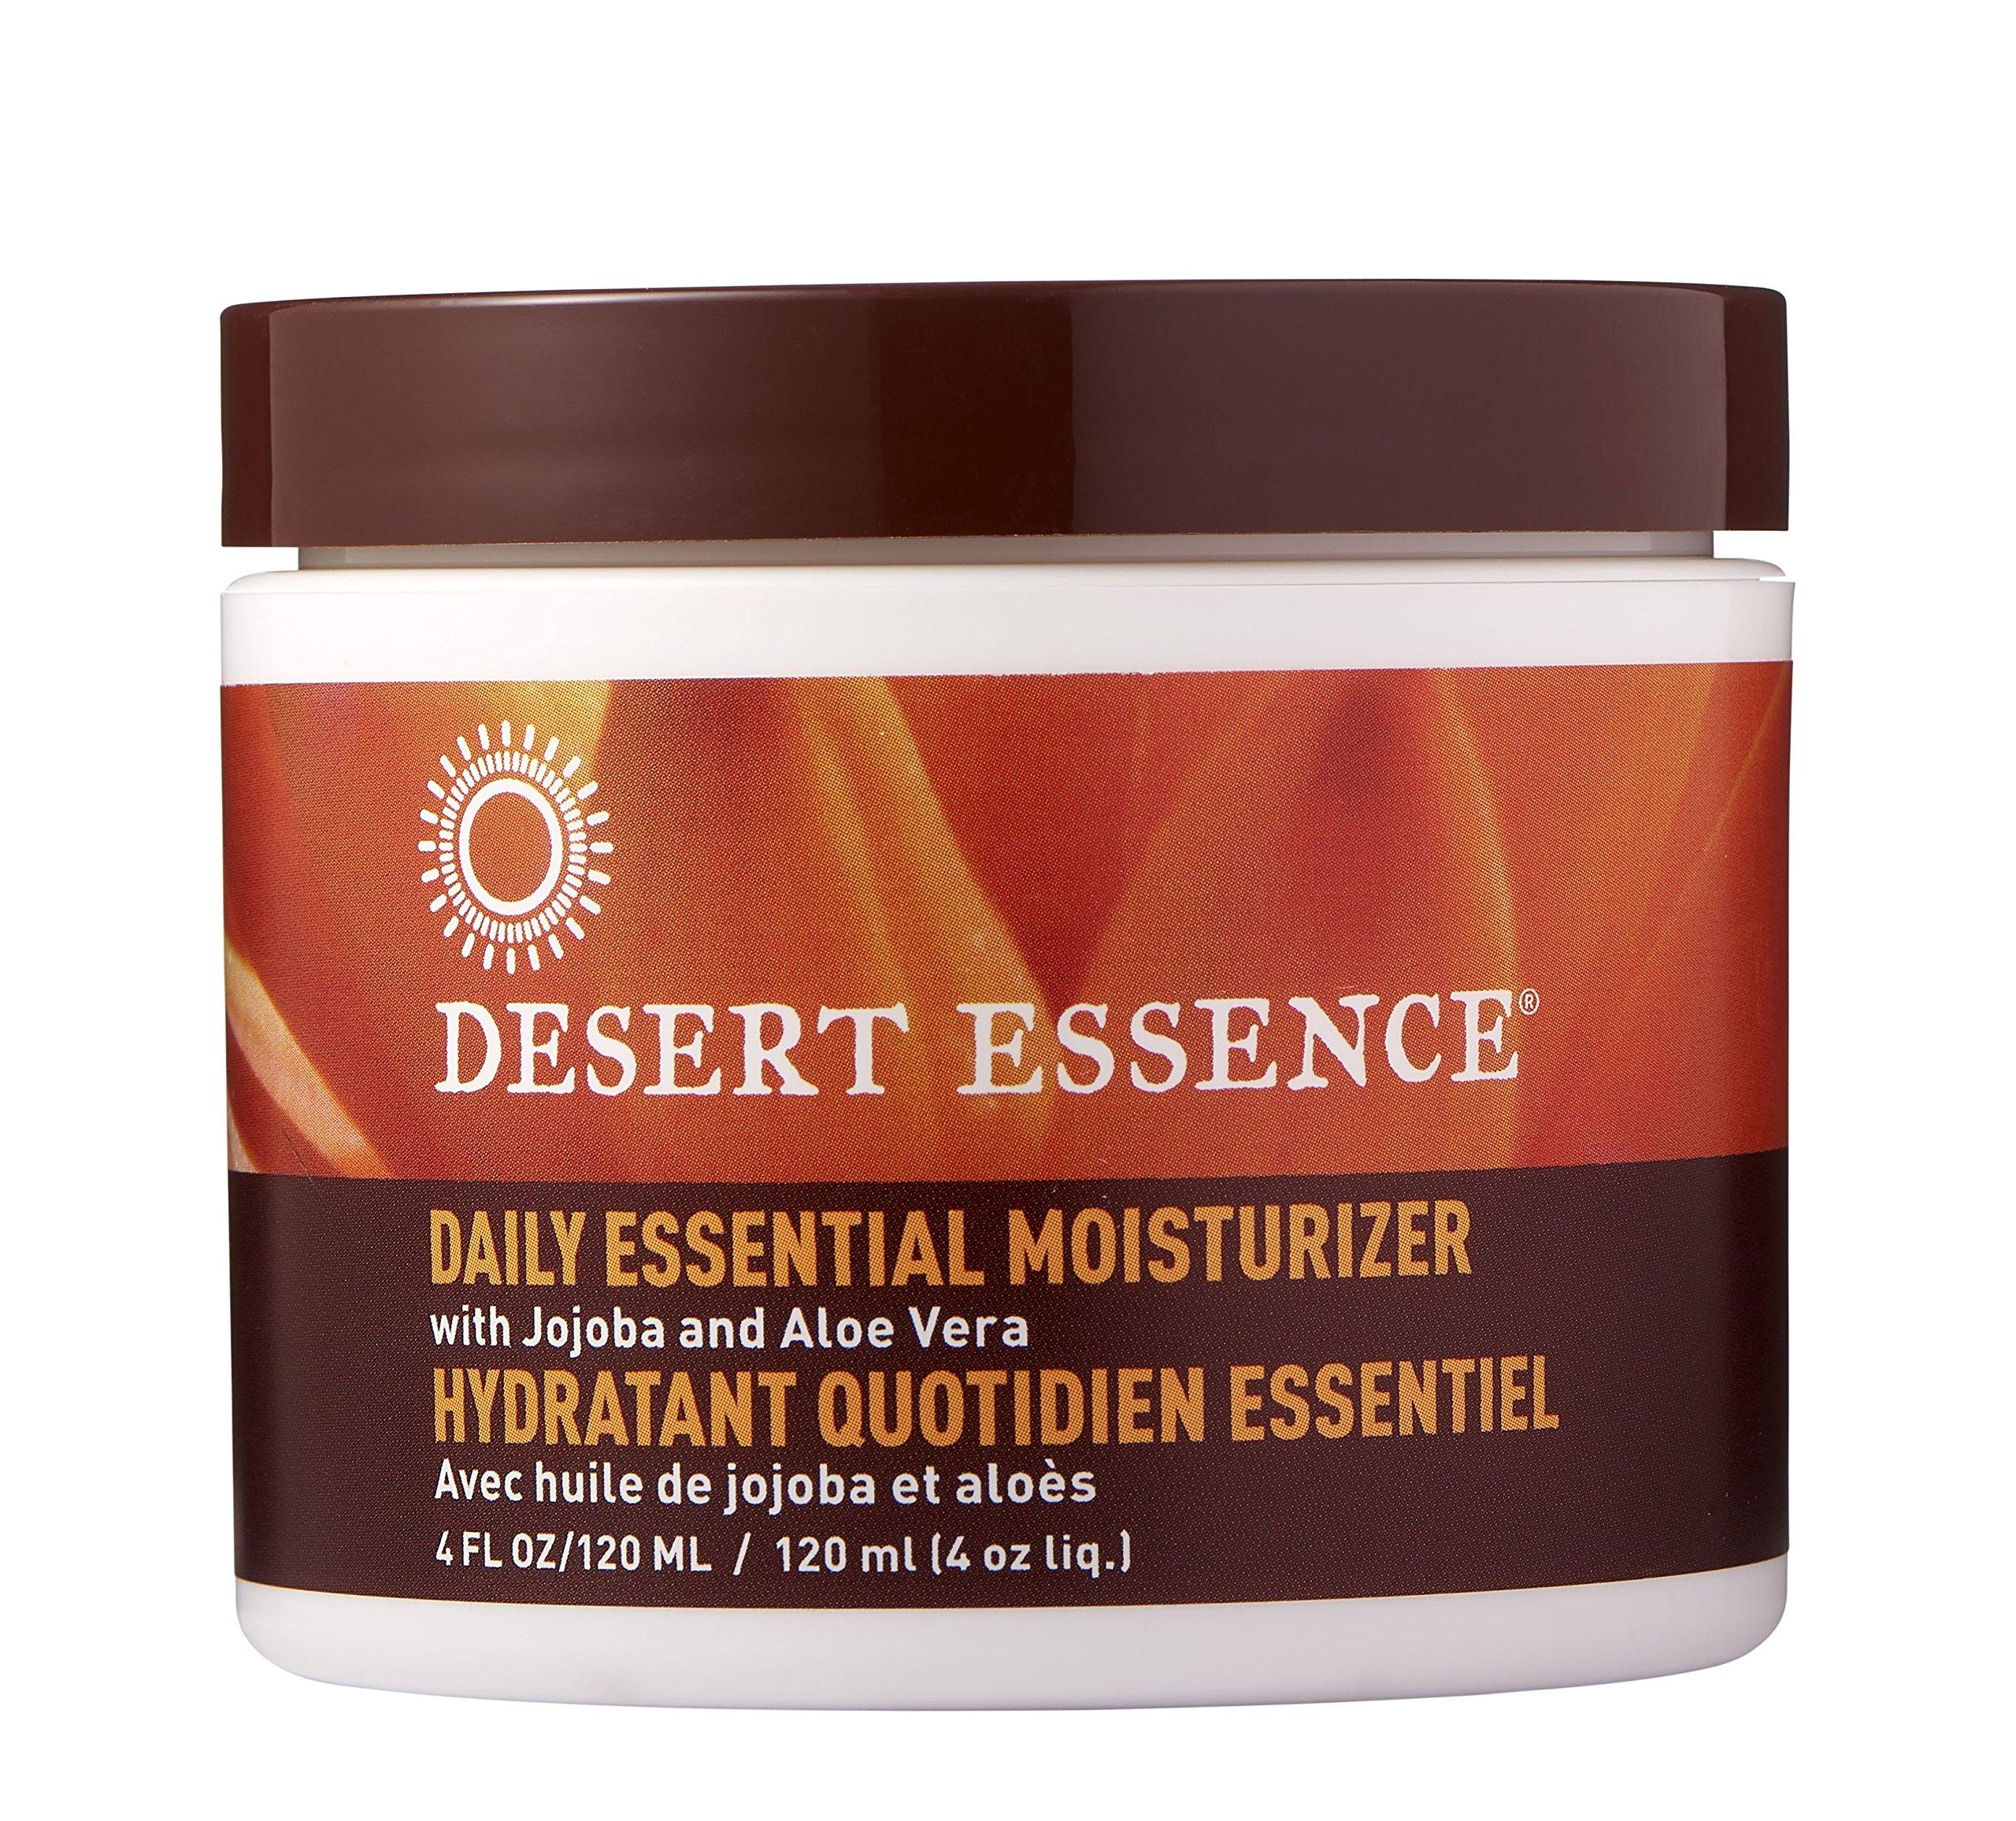 Desert Essence Daily Face Moisturizer - 4 fl oz